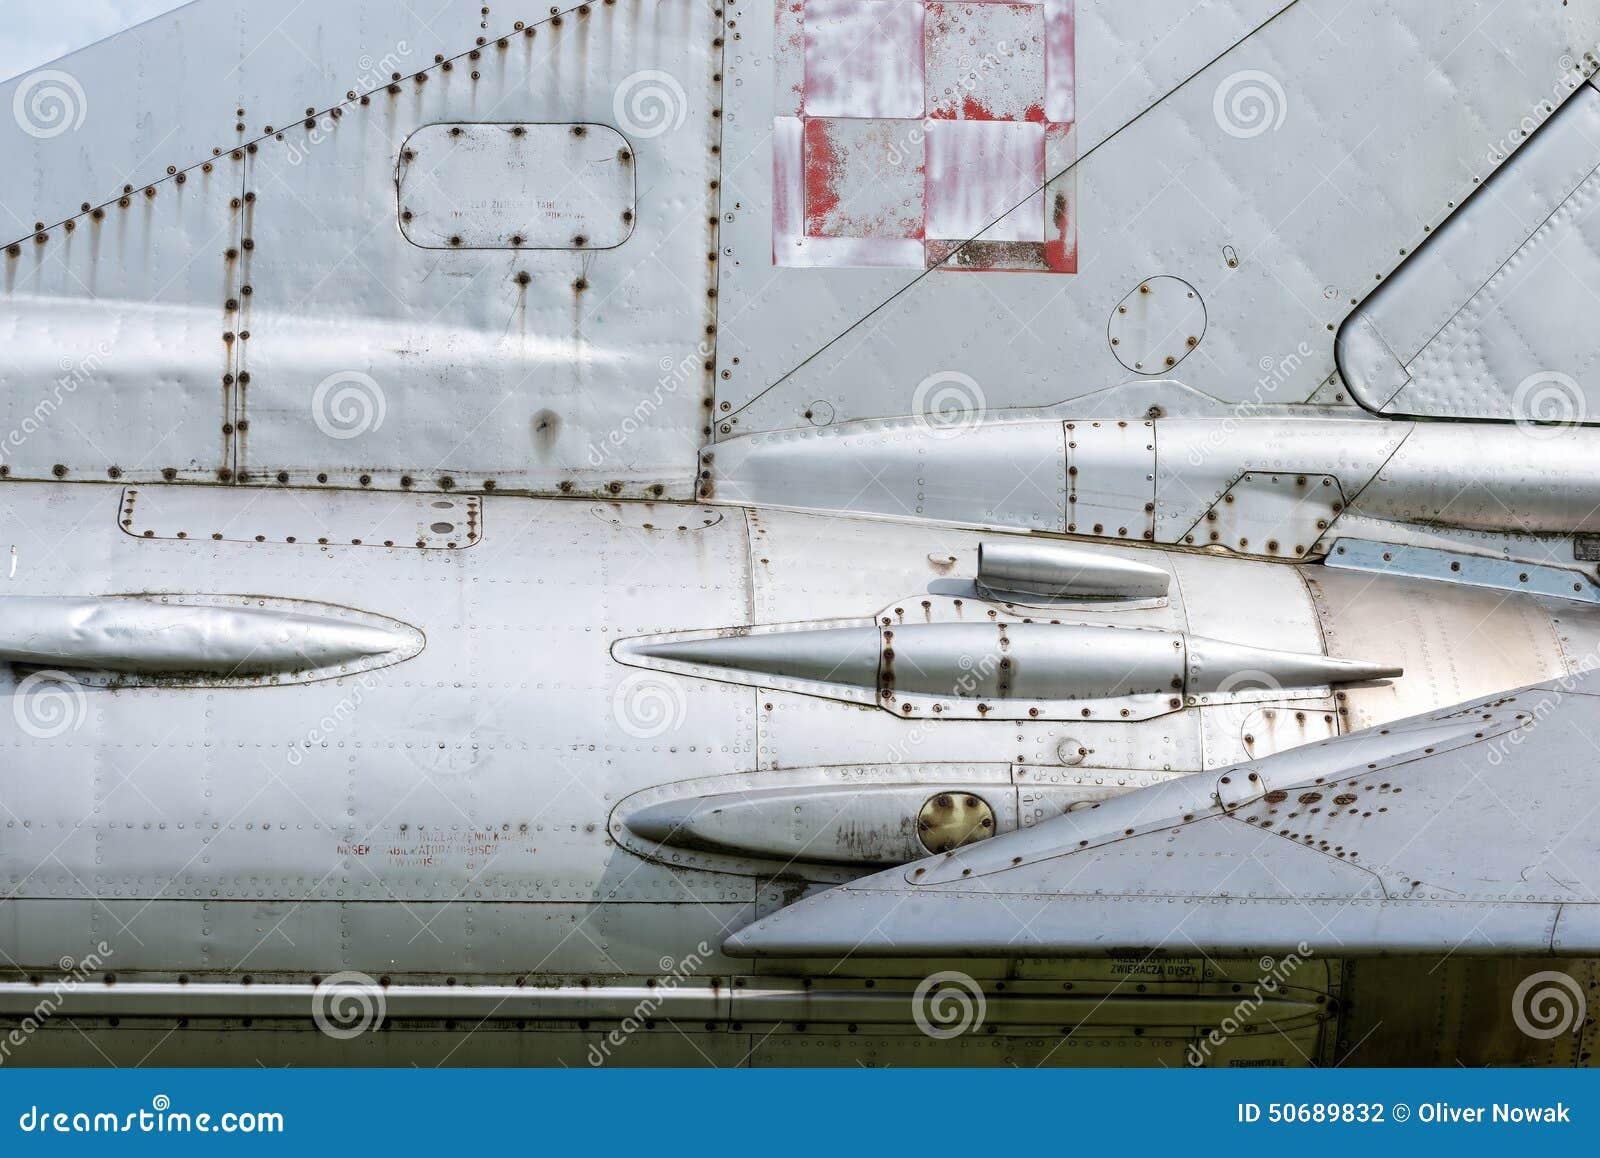 Download 米格-21 库存照片. 图片 包括有 突发事件, 飞行, 喷气机, 油漆, 飞机, mikoyan, alameda - 50689832